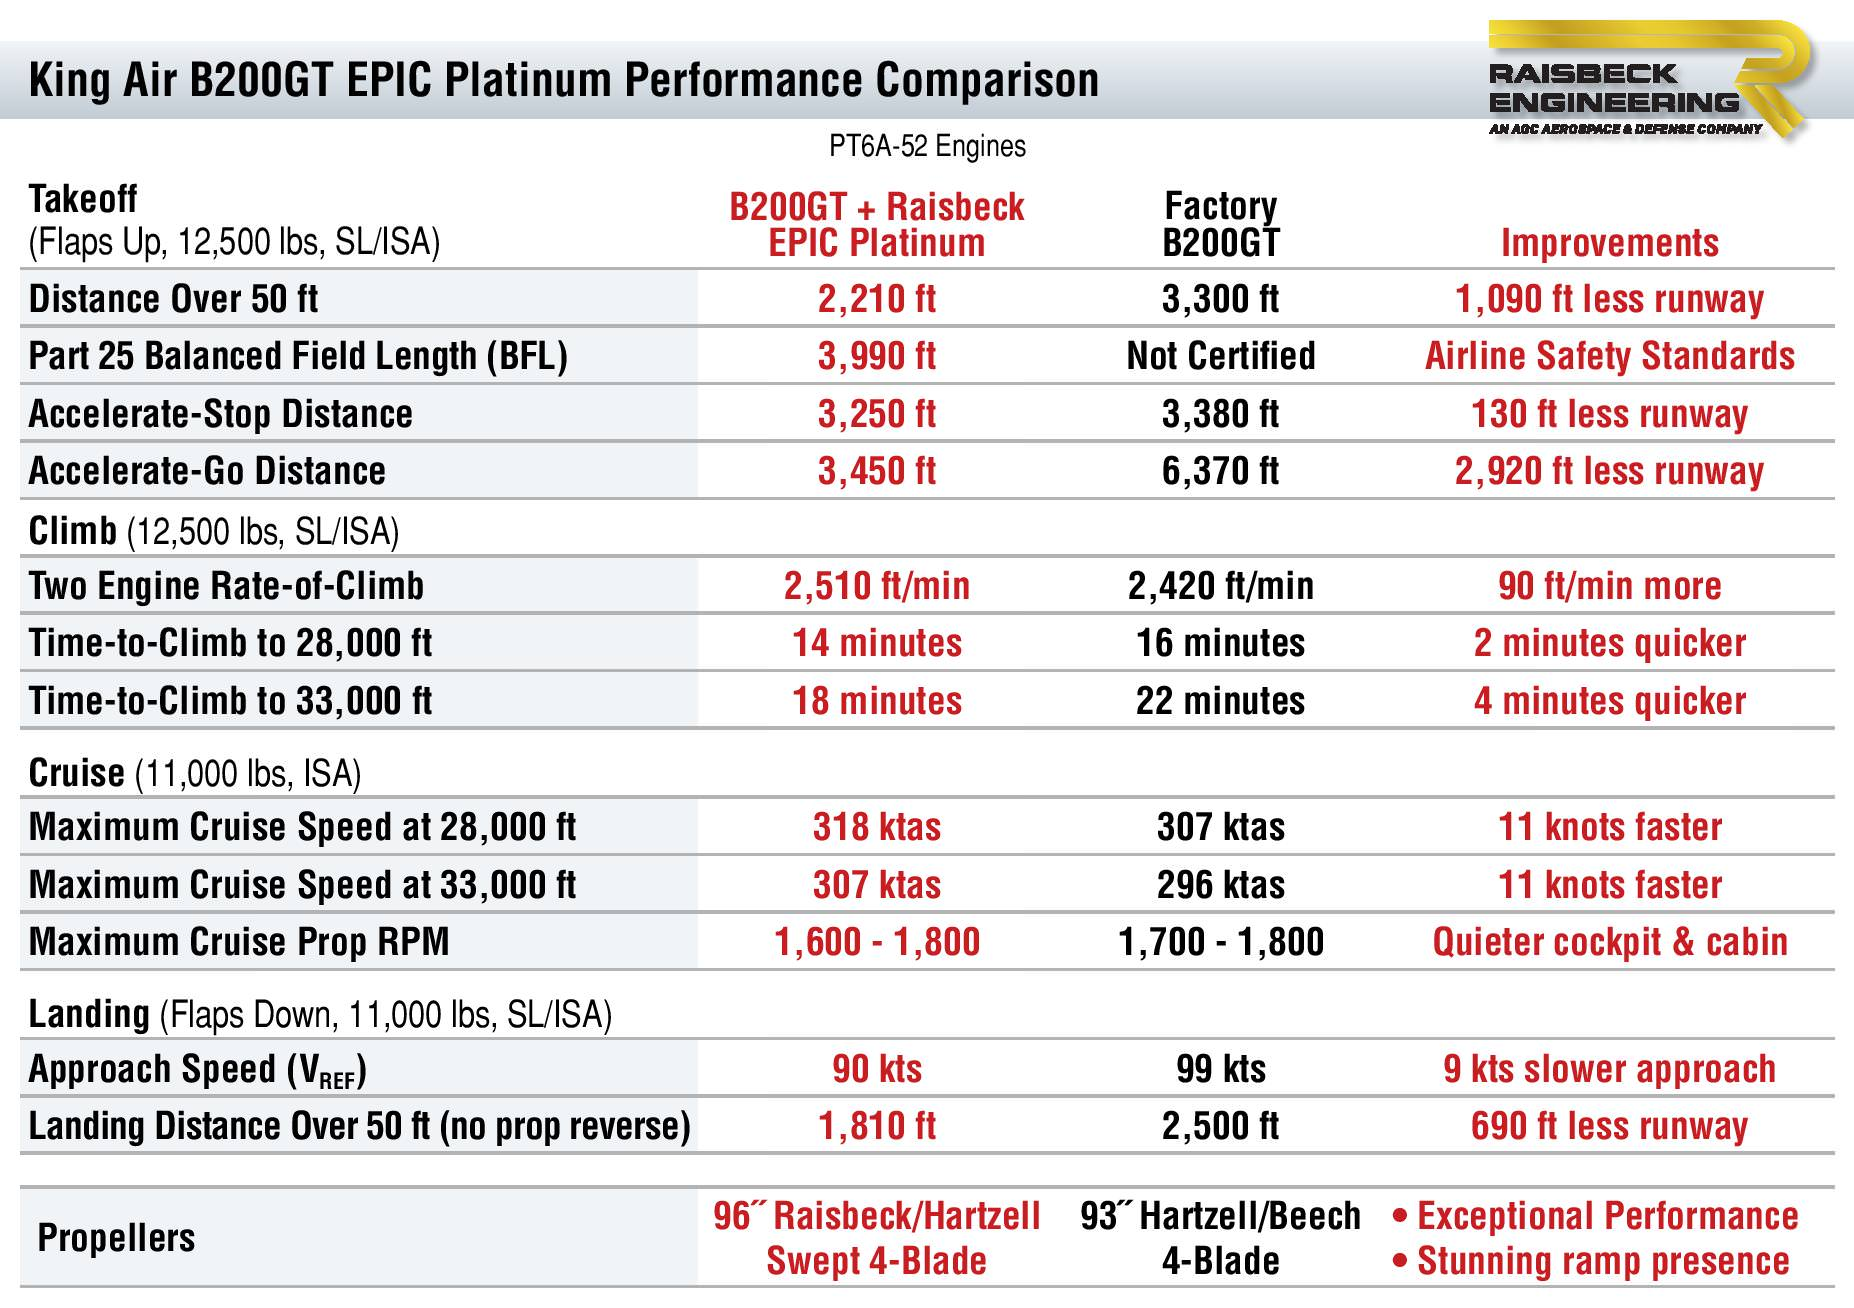 B200GT EPIC Platinum Performance Table